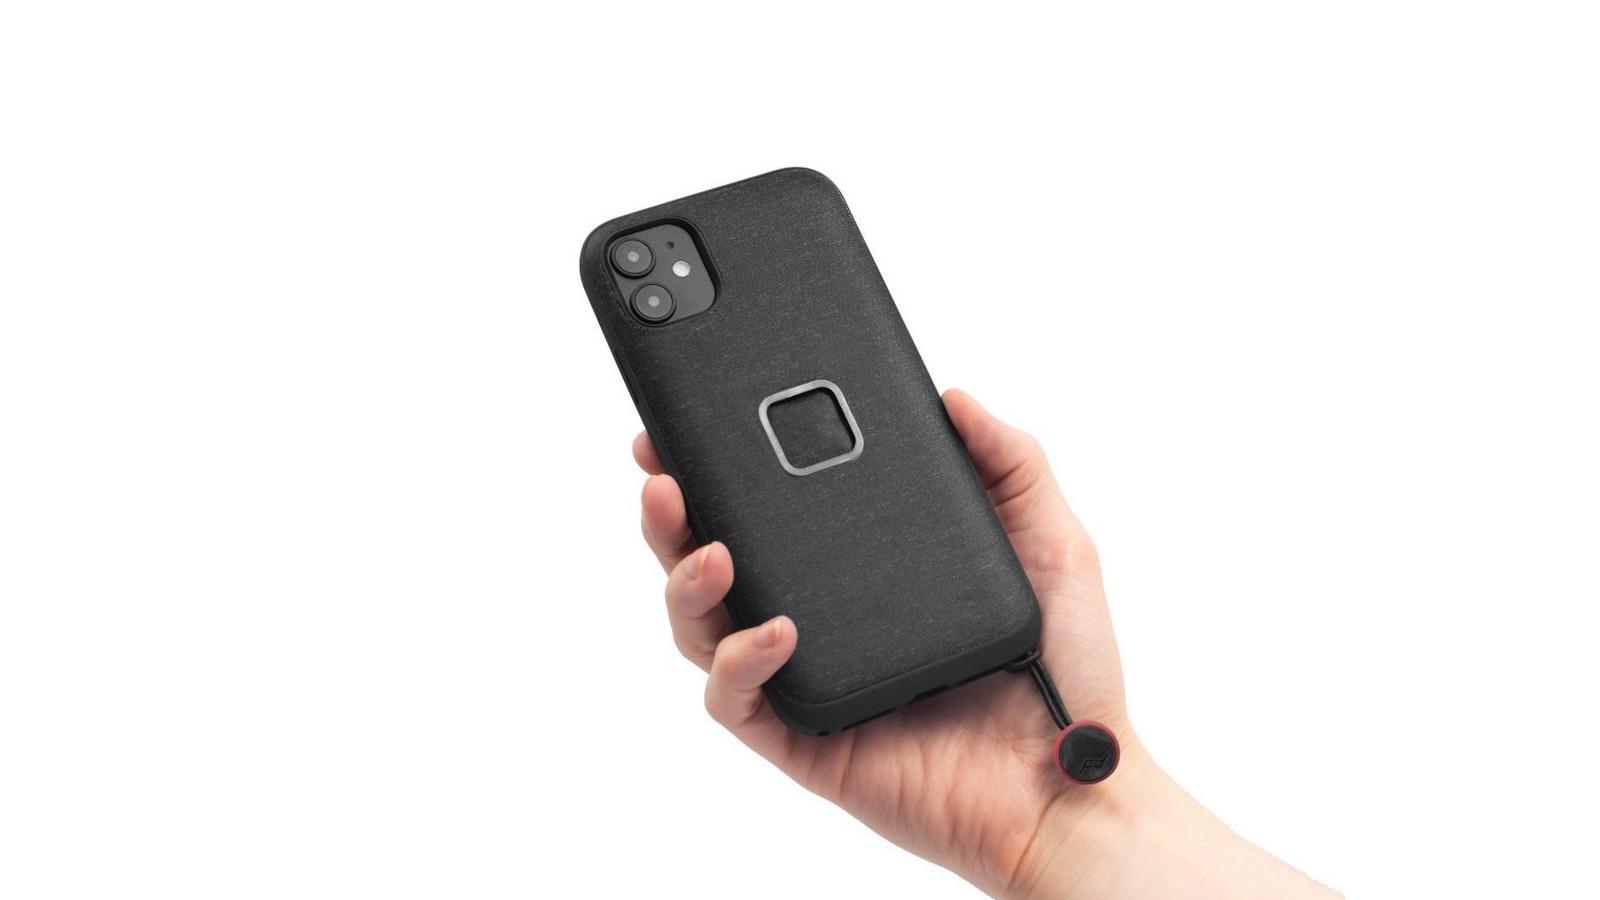 Peak Design Everyday Case adds zero bulk to your iPhone